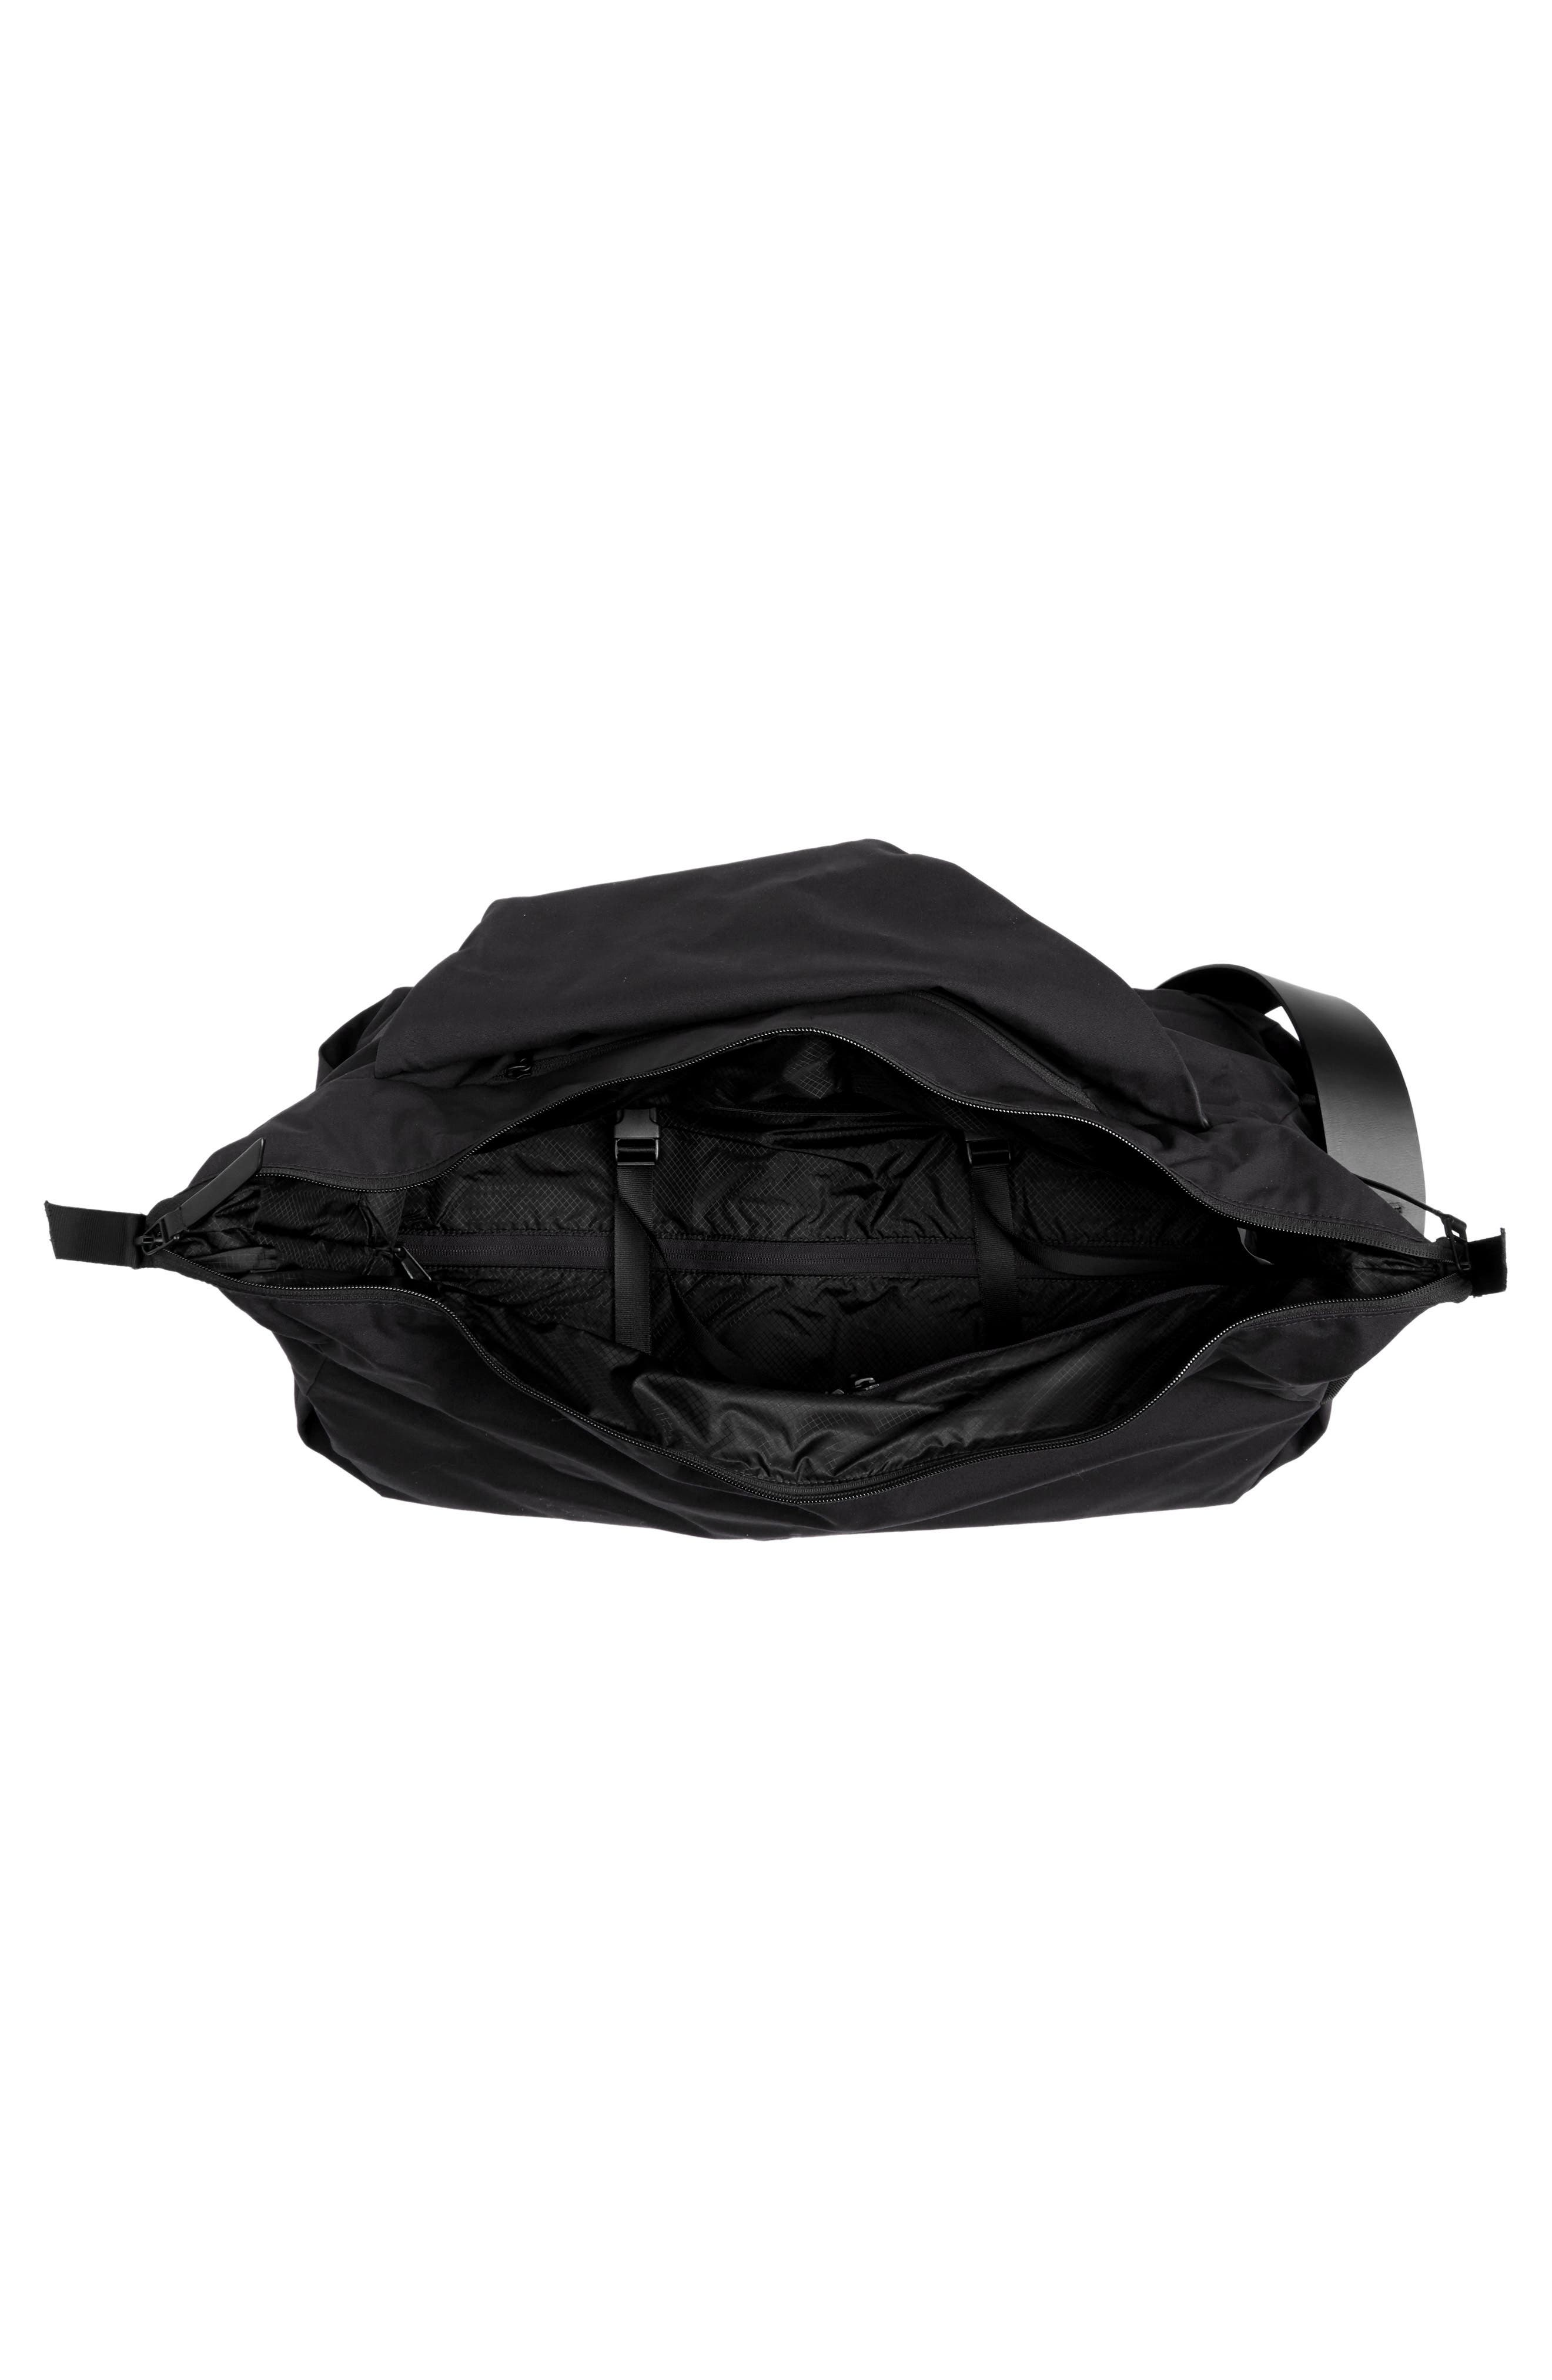 Lux Daily Duffel Bag,                             Alternate thumbnail 4, color,                             001